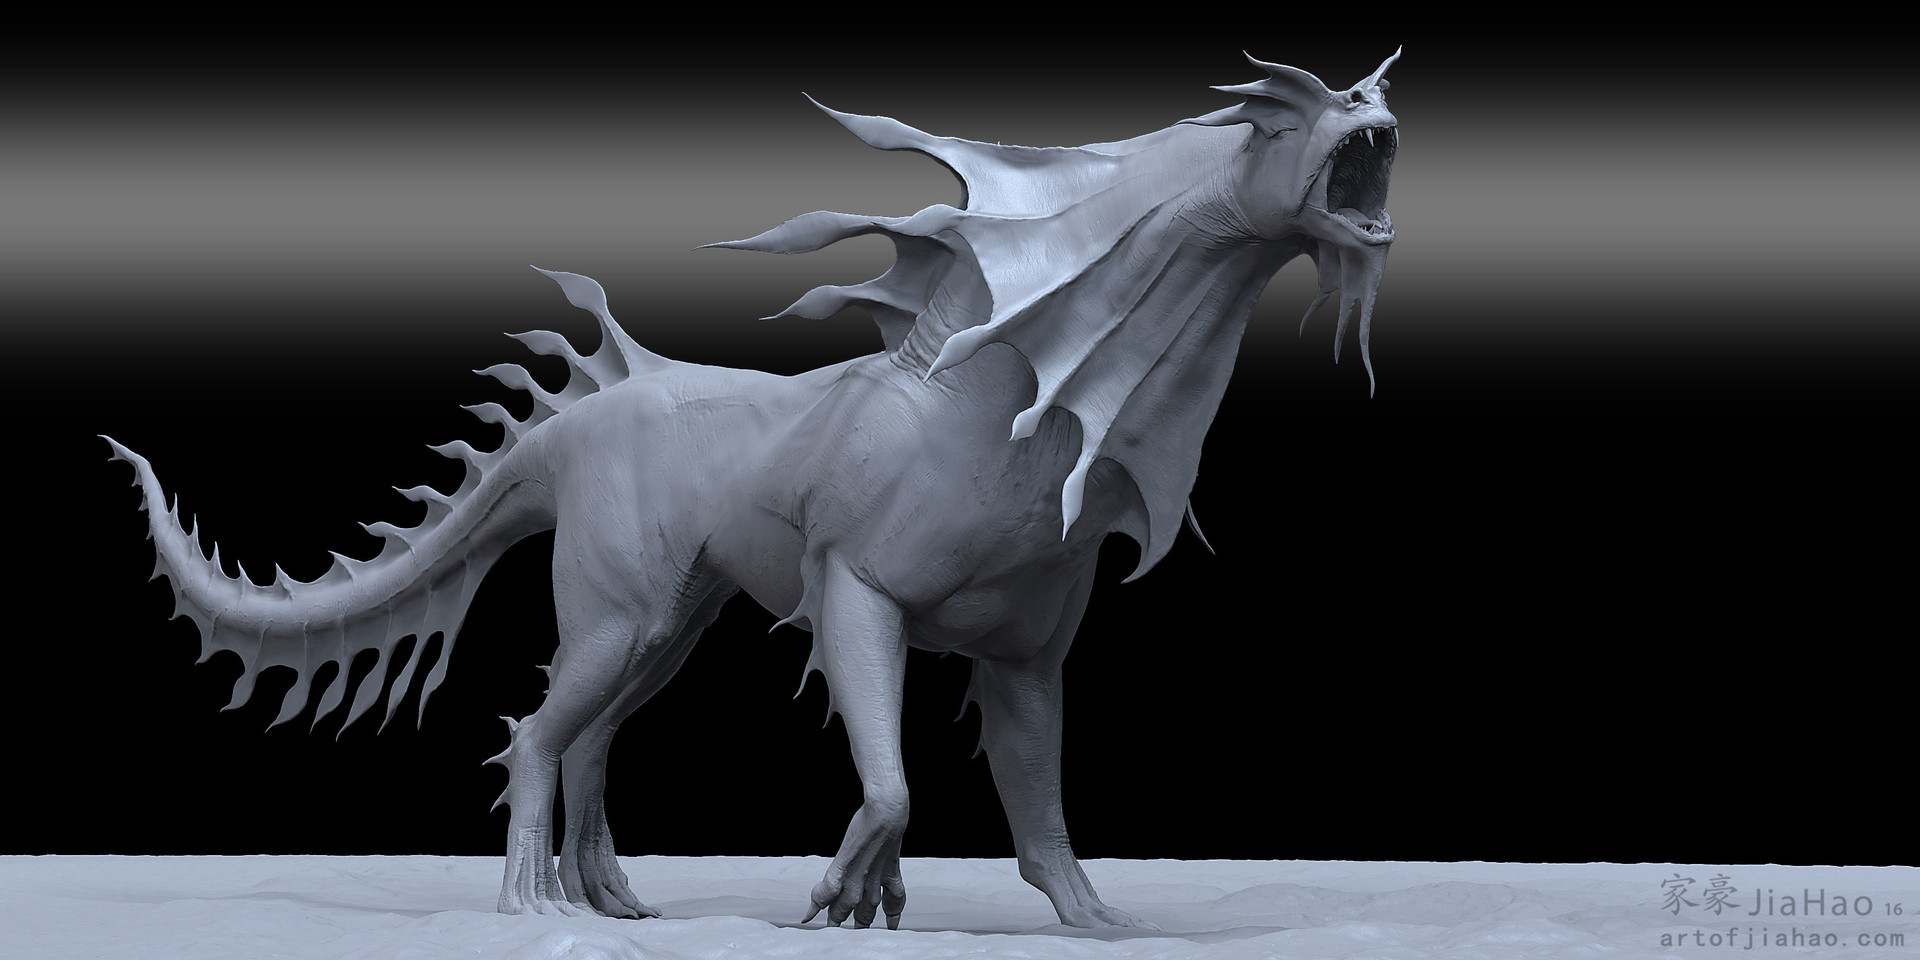 Jia hao 2016 03 twilightpanther roaring presentation 03